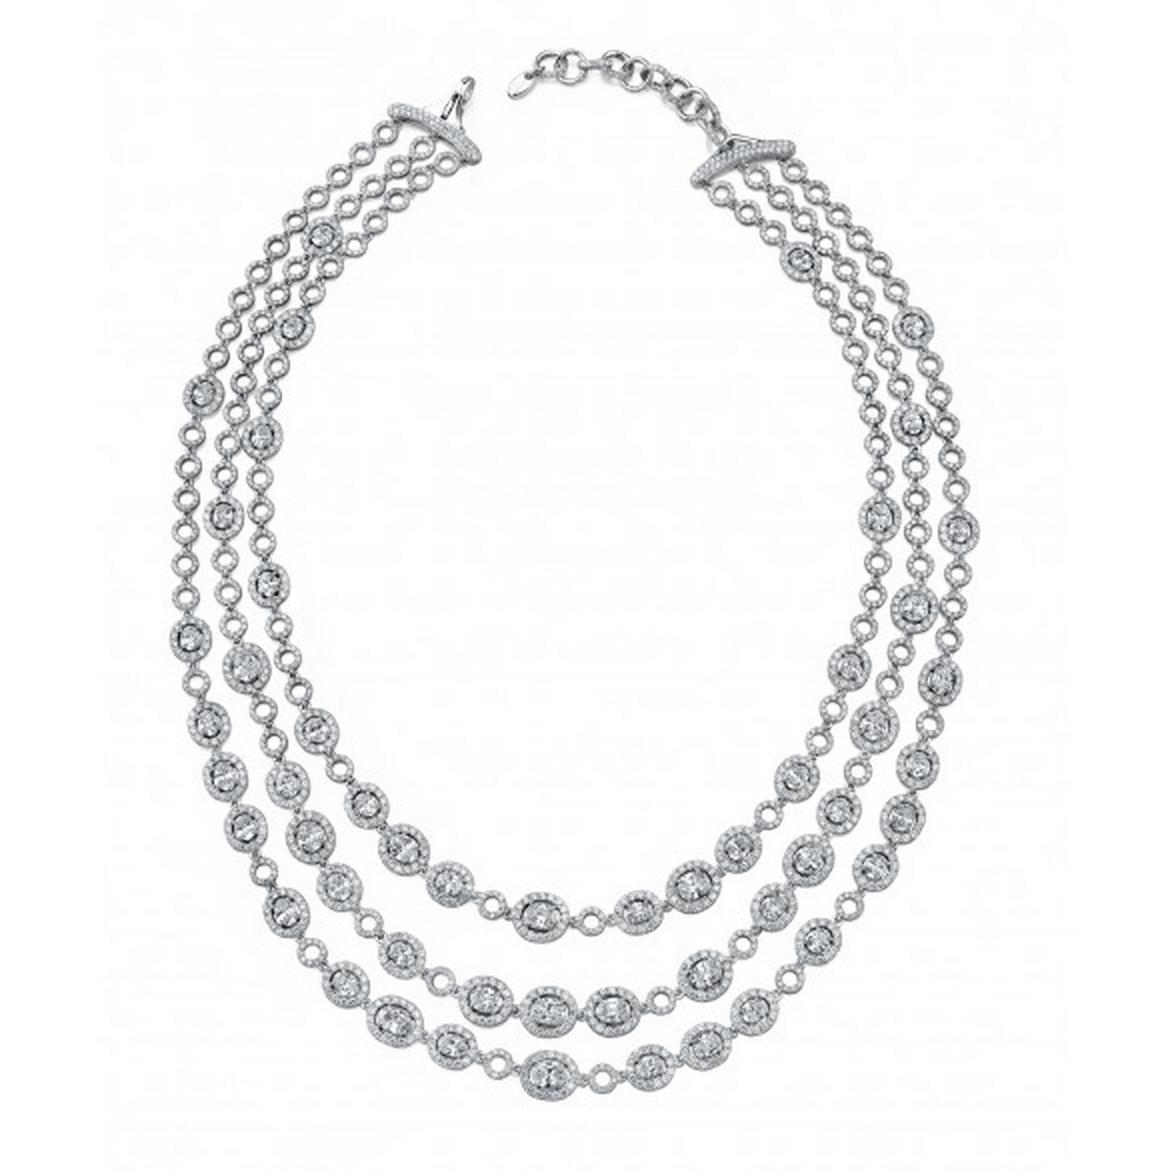 uneekjewelry.com